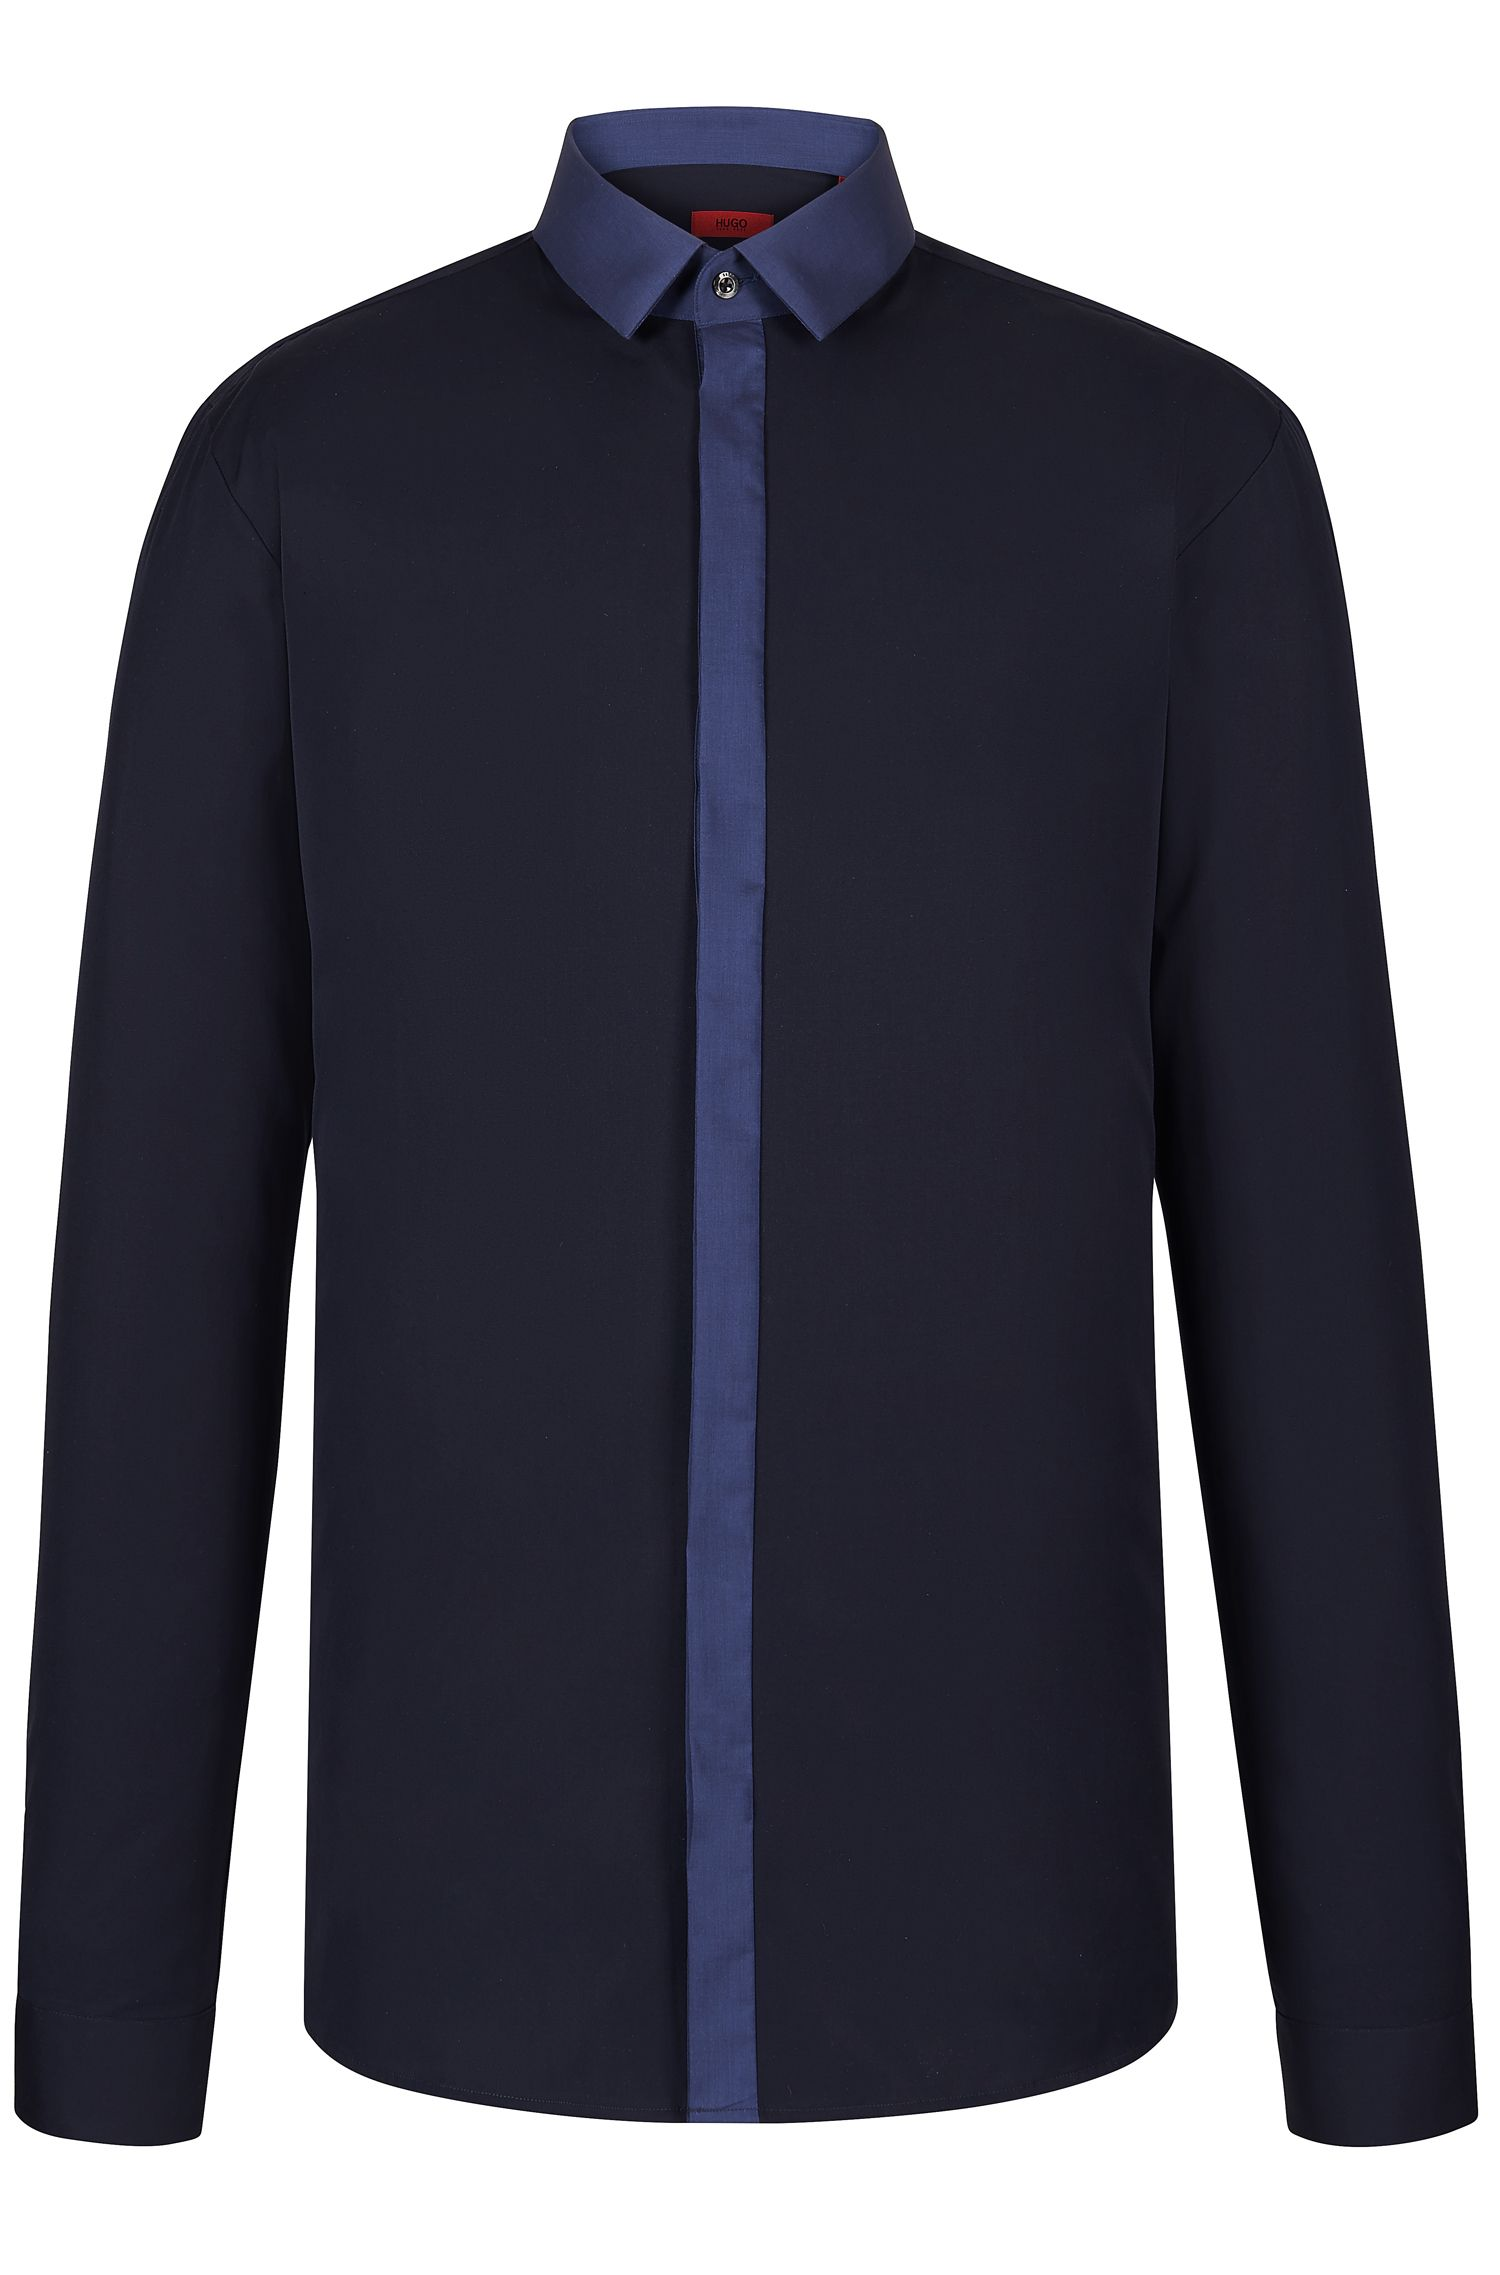 'Edinburgh' | Slim Fit, Cotton Button Down Shirt